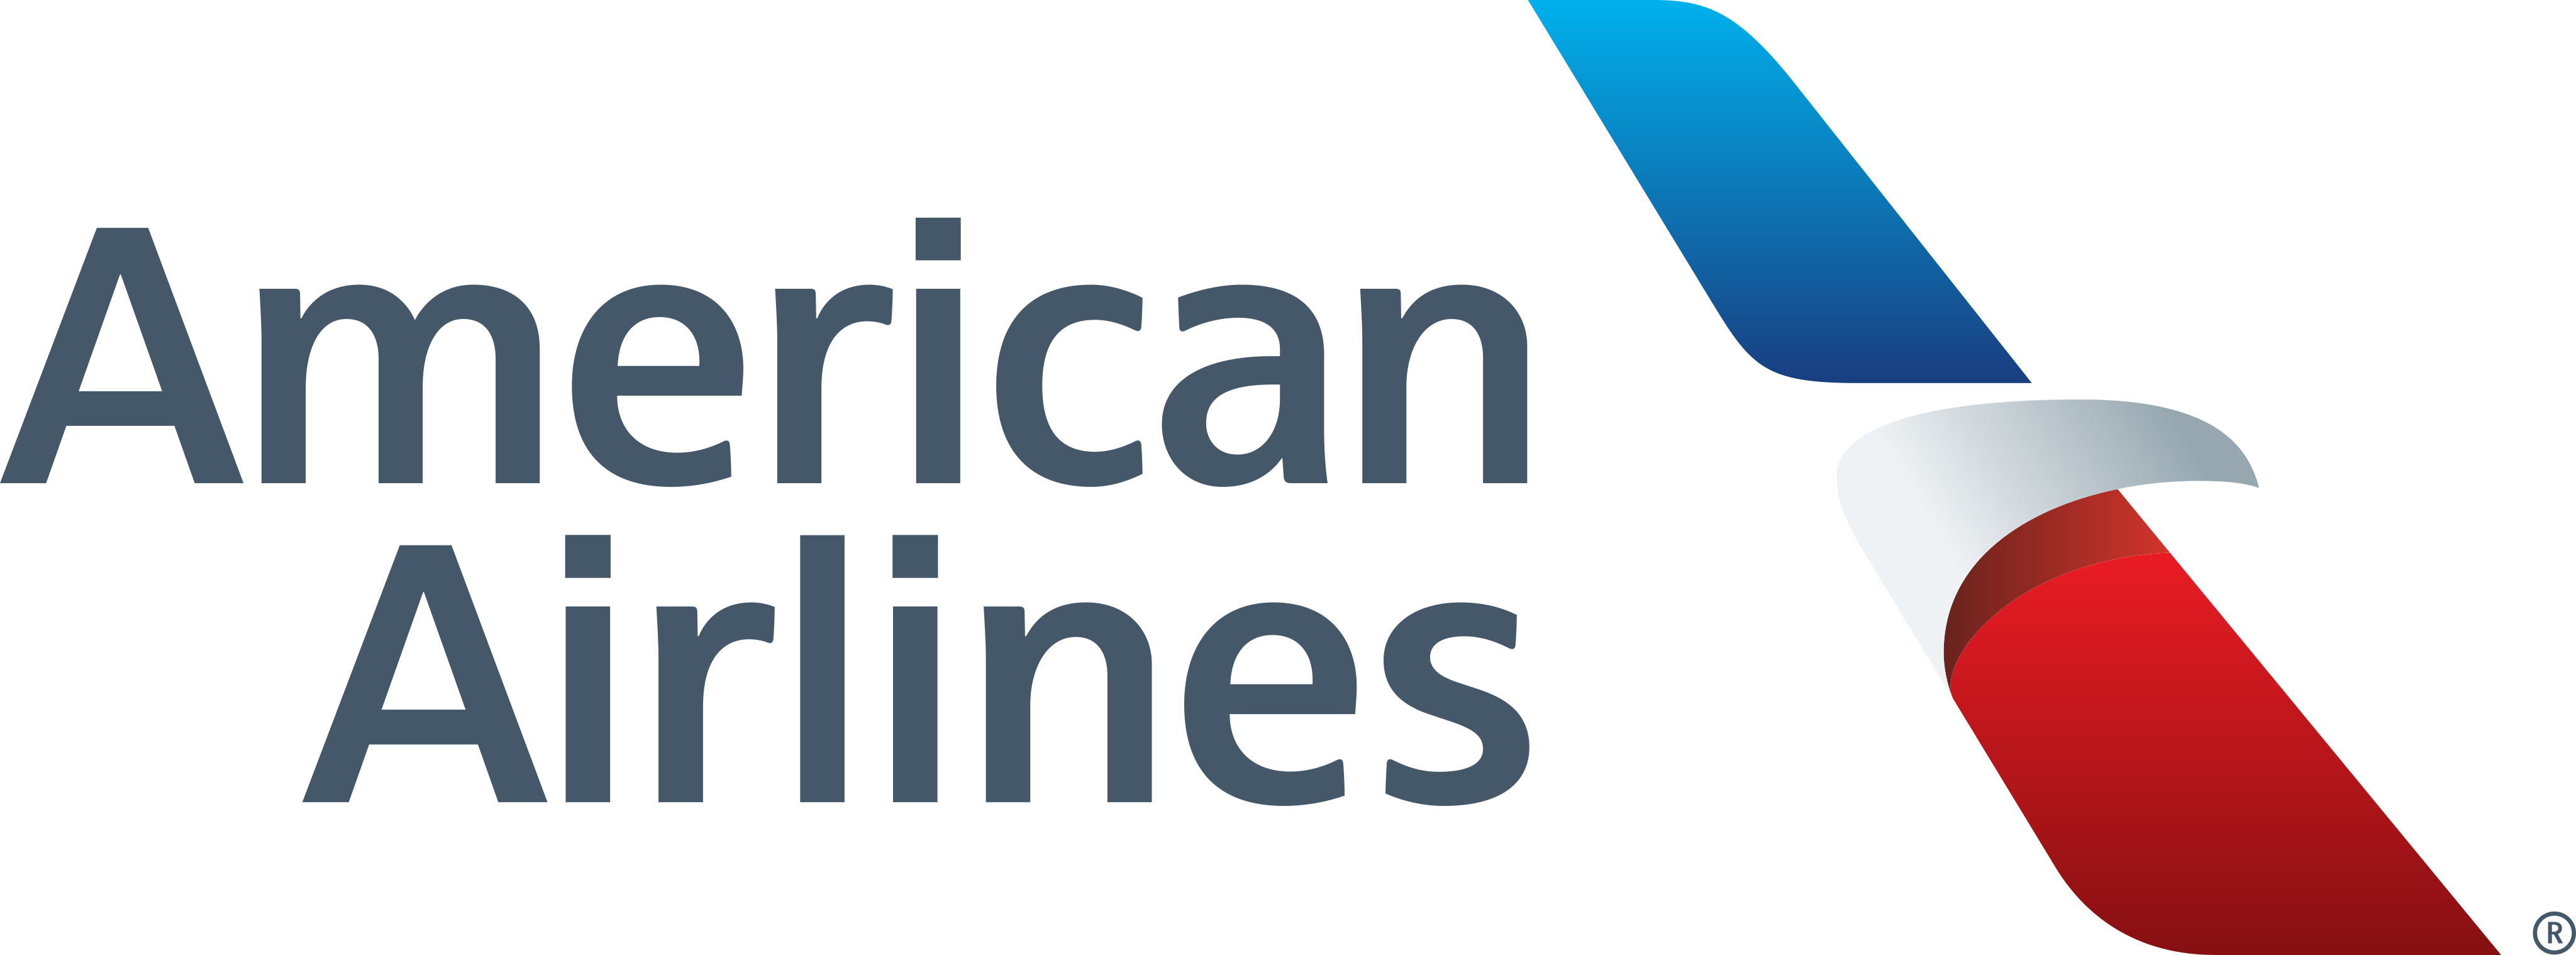 ACCIONES AMERICAN AIRLINES